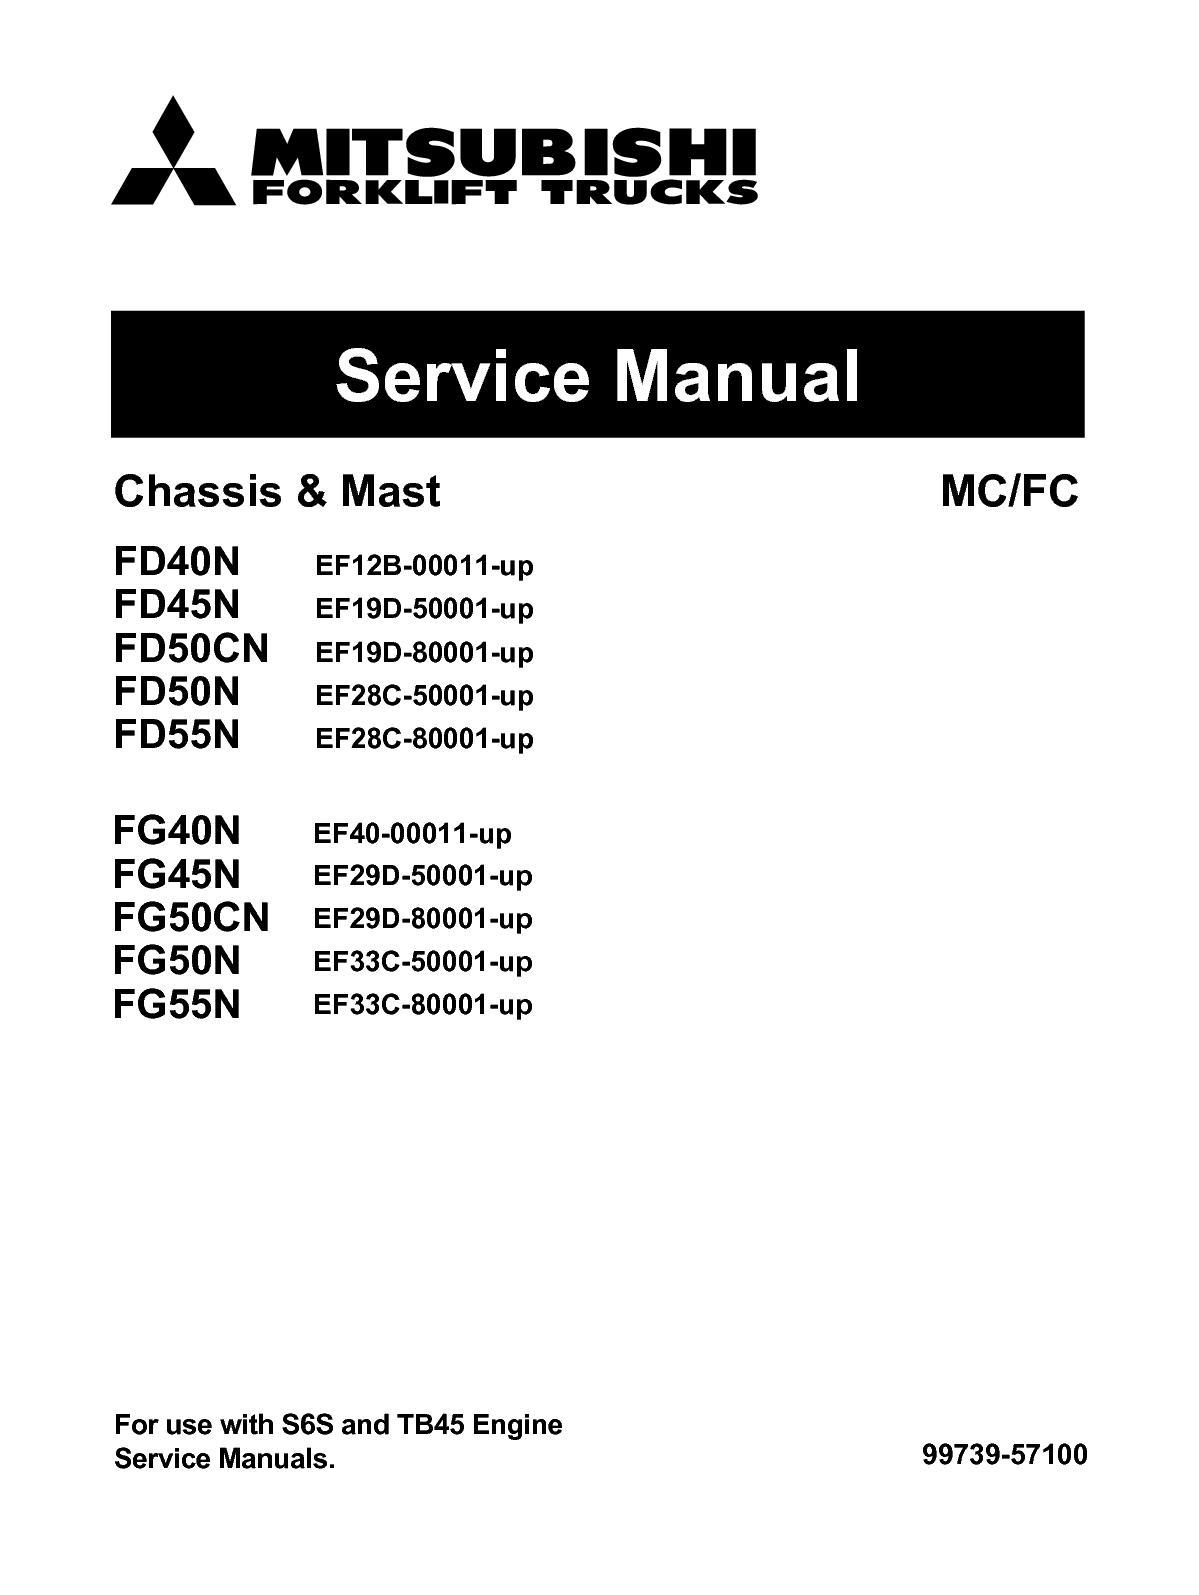 Calamo Mitsubishi Fg55n Forklift Trucks Service Repair Manual Sn Old Wiring Diagram For Ef33c 80001 Up